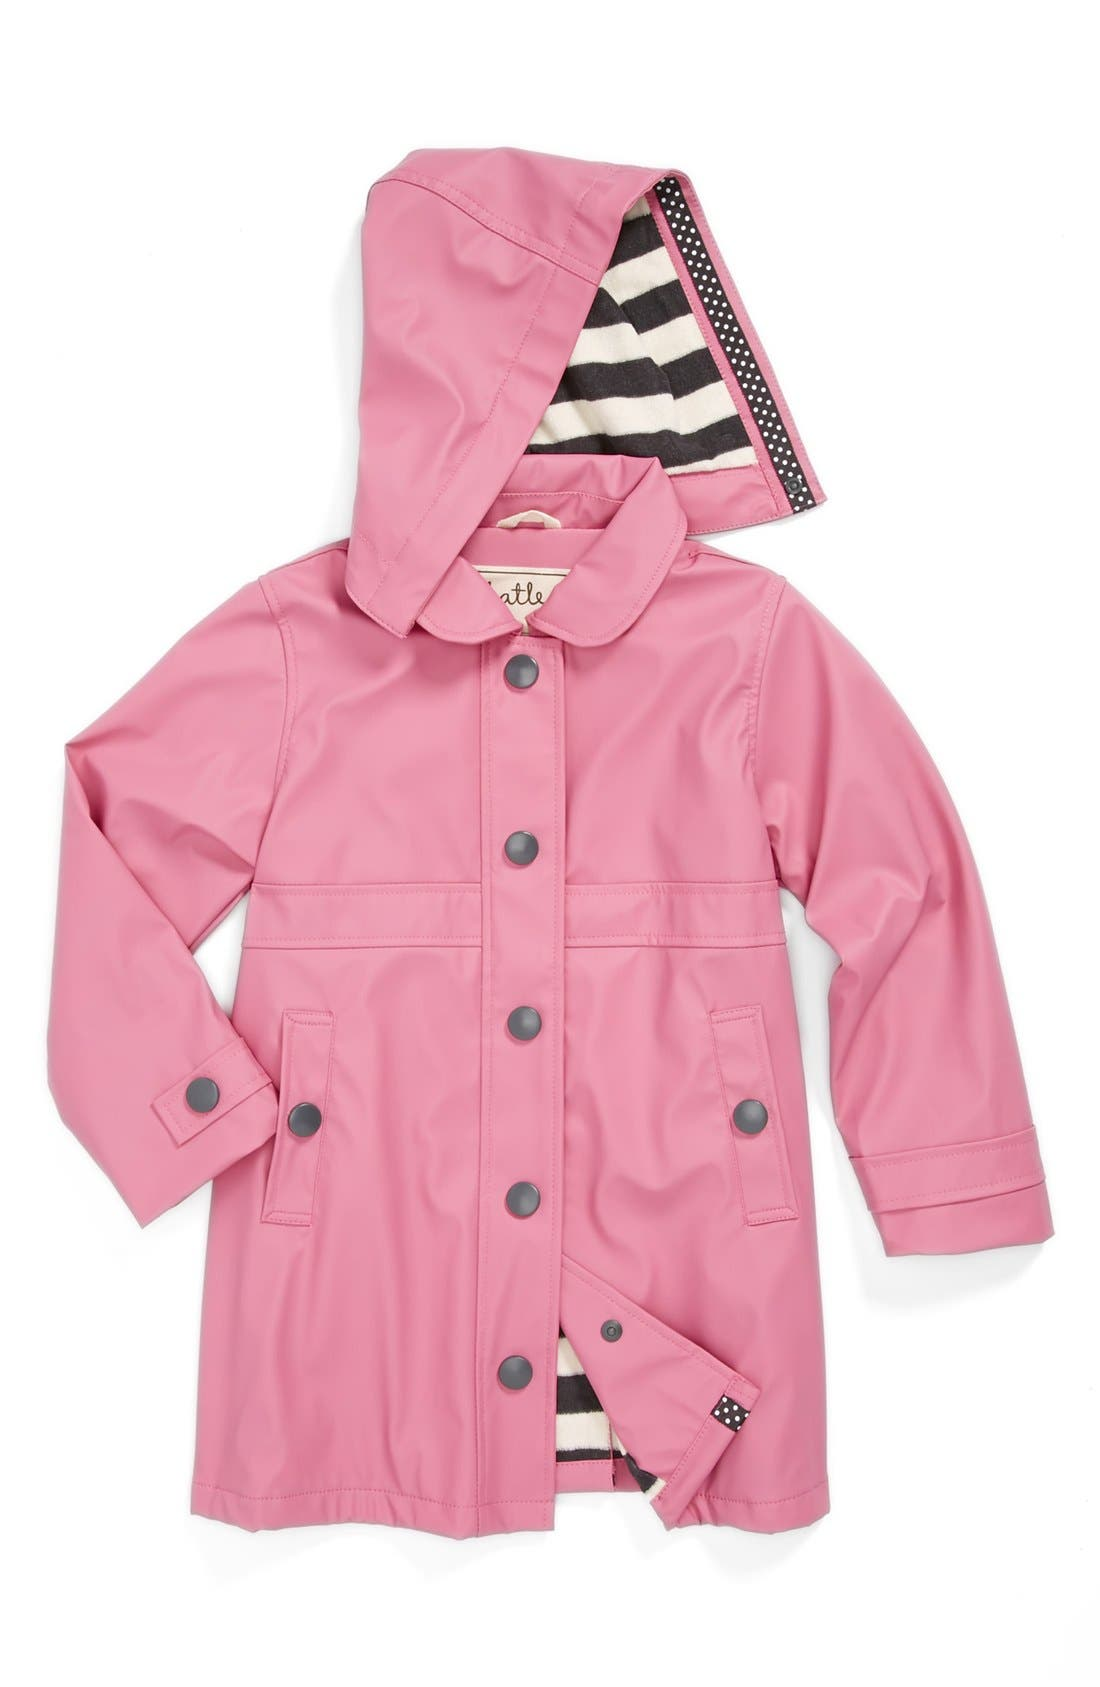 Main Image - Hatley 'Orchid Lily' Rain Jacket (Toddler Girls, Little Girls & Big Girls)